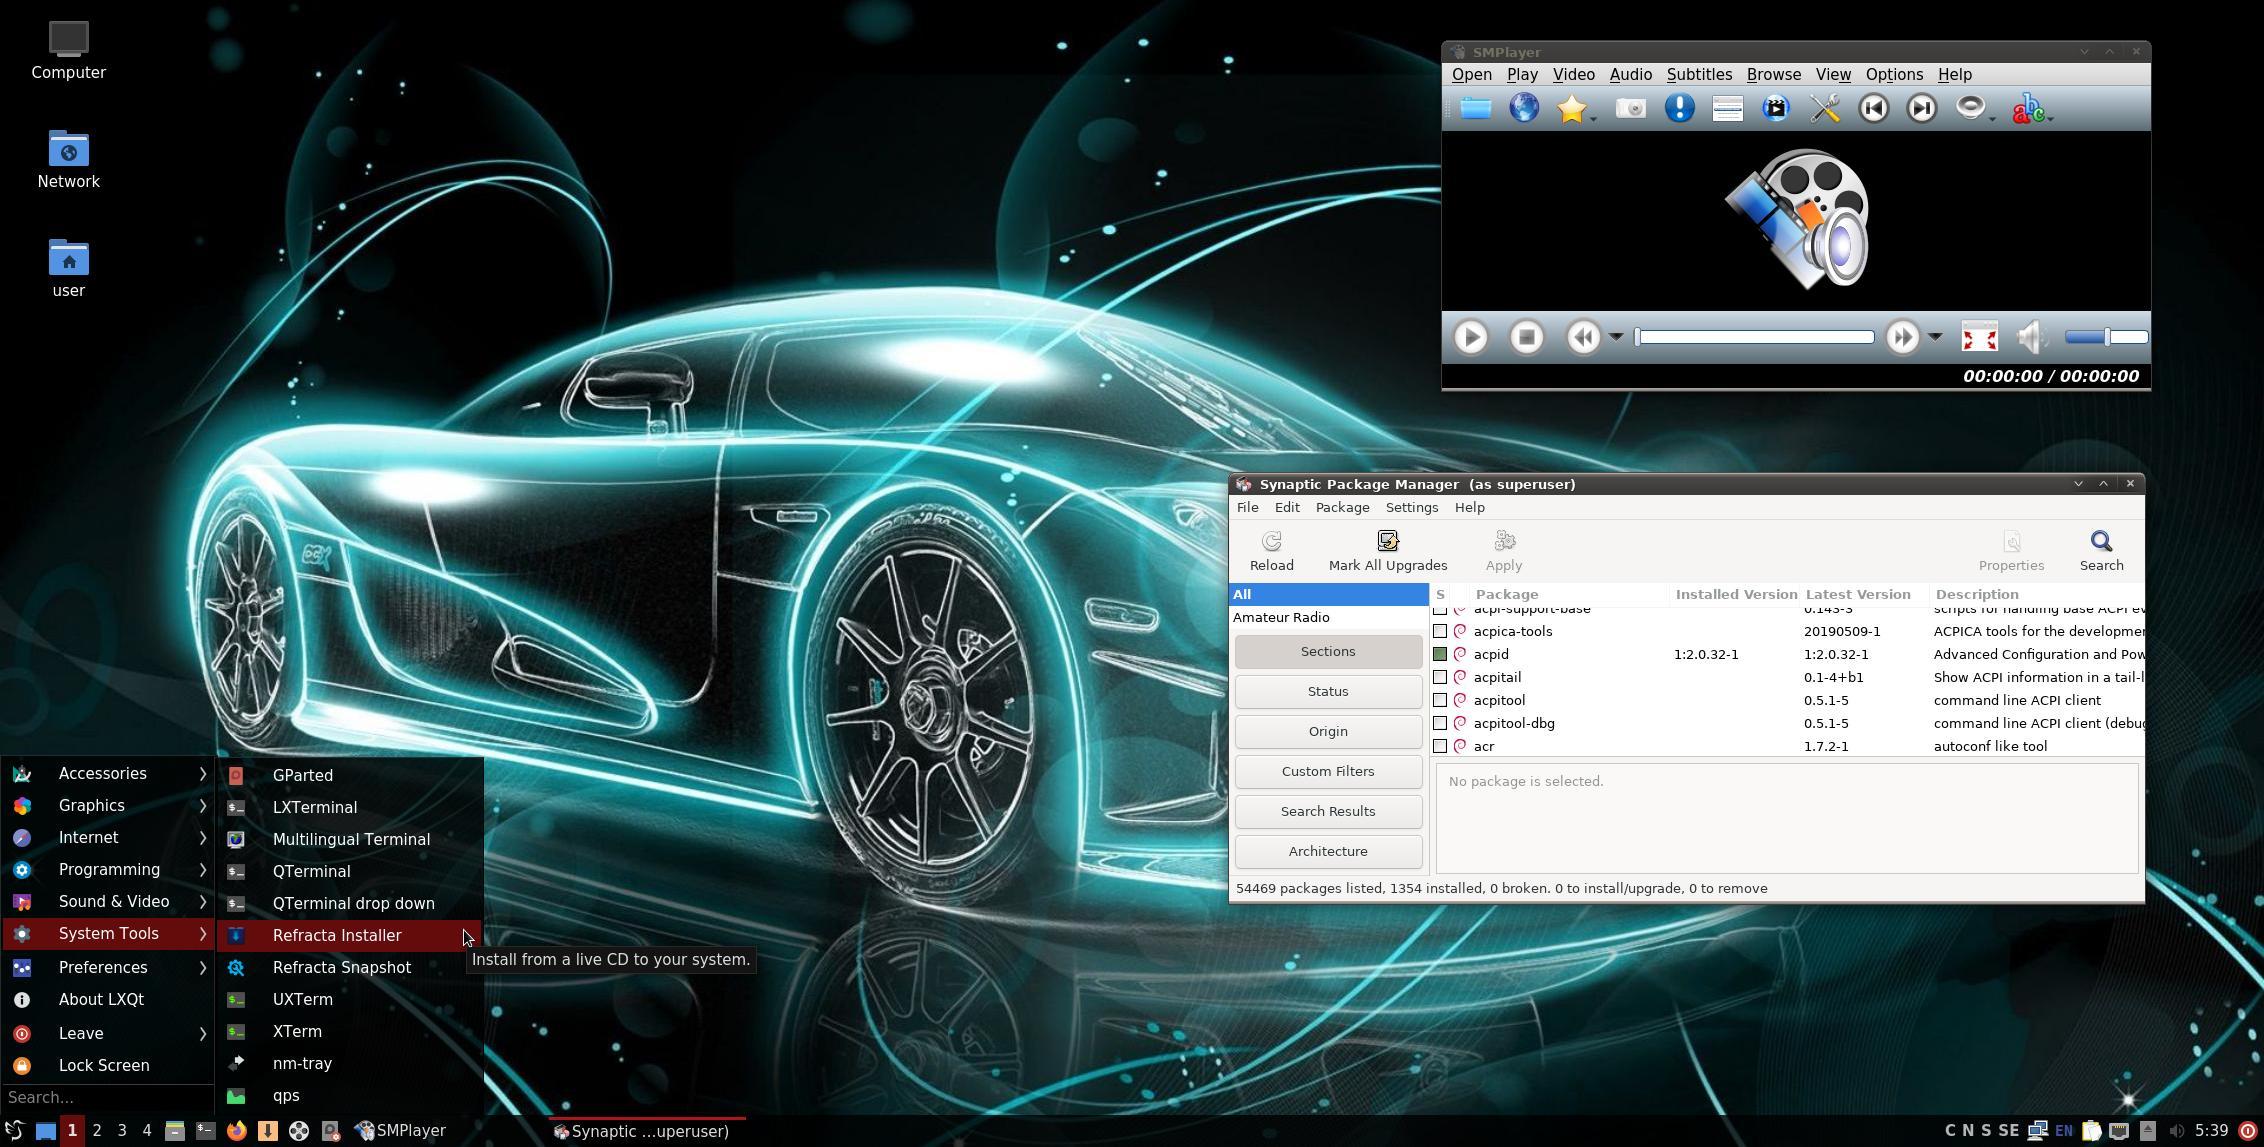 Debex Linux Distro Released For Older Pcs With Lxqt Desktop And Linux Kernel 5 4